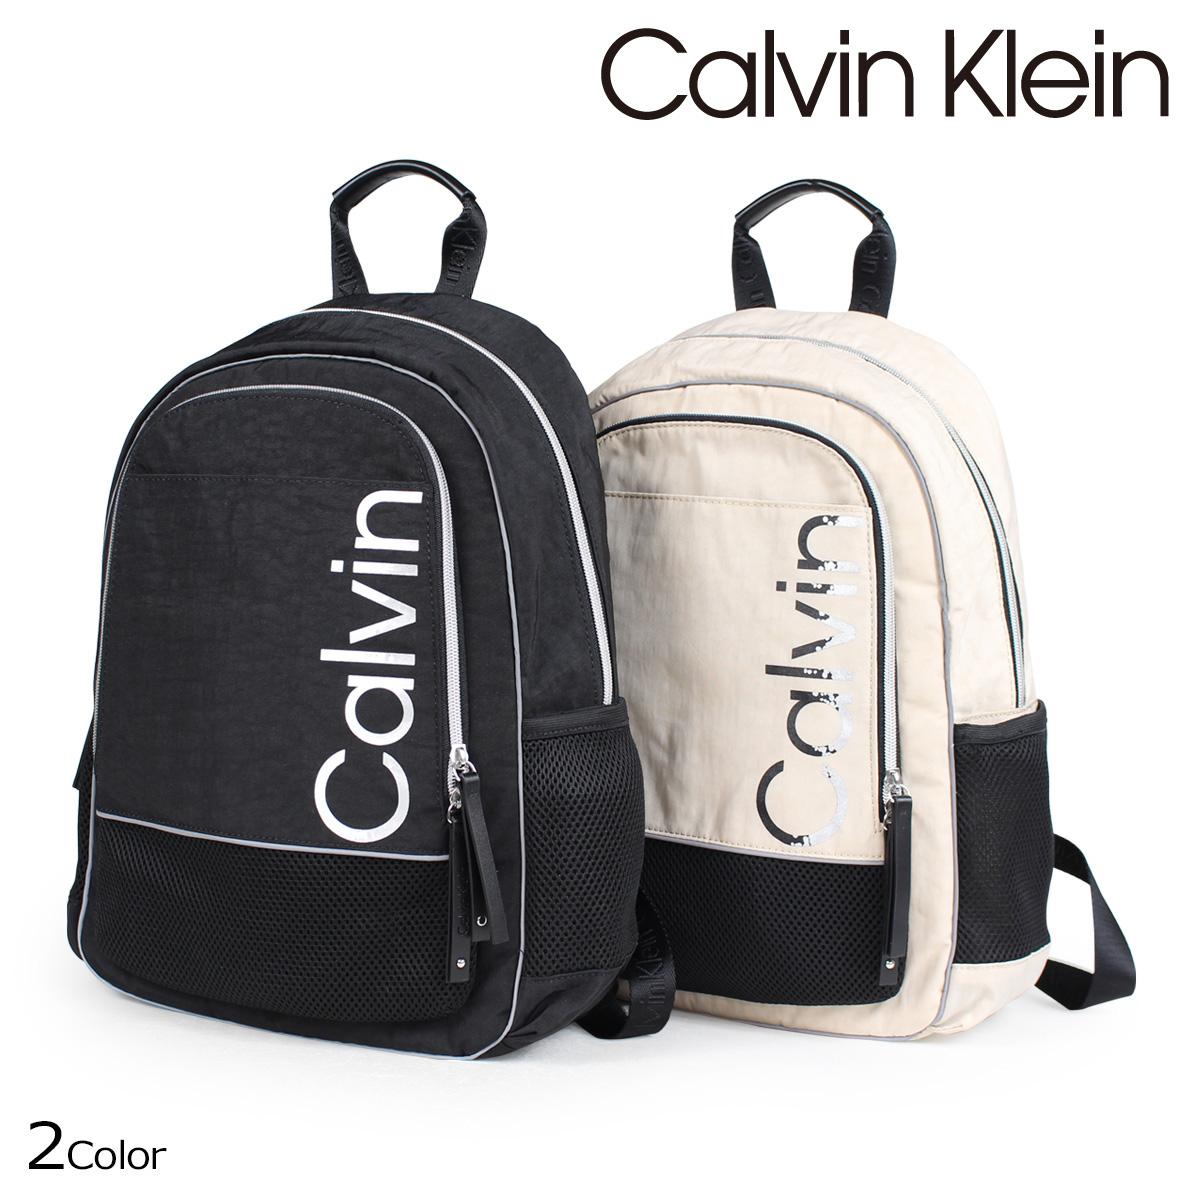 Calvin Klein ATHLEISURE BACKPACK カルバンクライン バッグ メンズ レディース リュック バッグパック ブラック ベージュ H7DKE6ZM